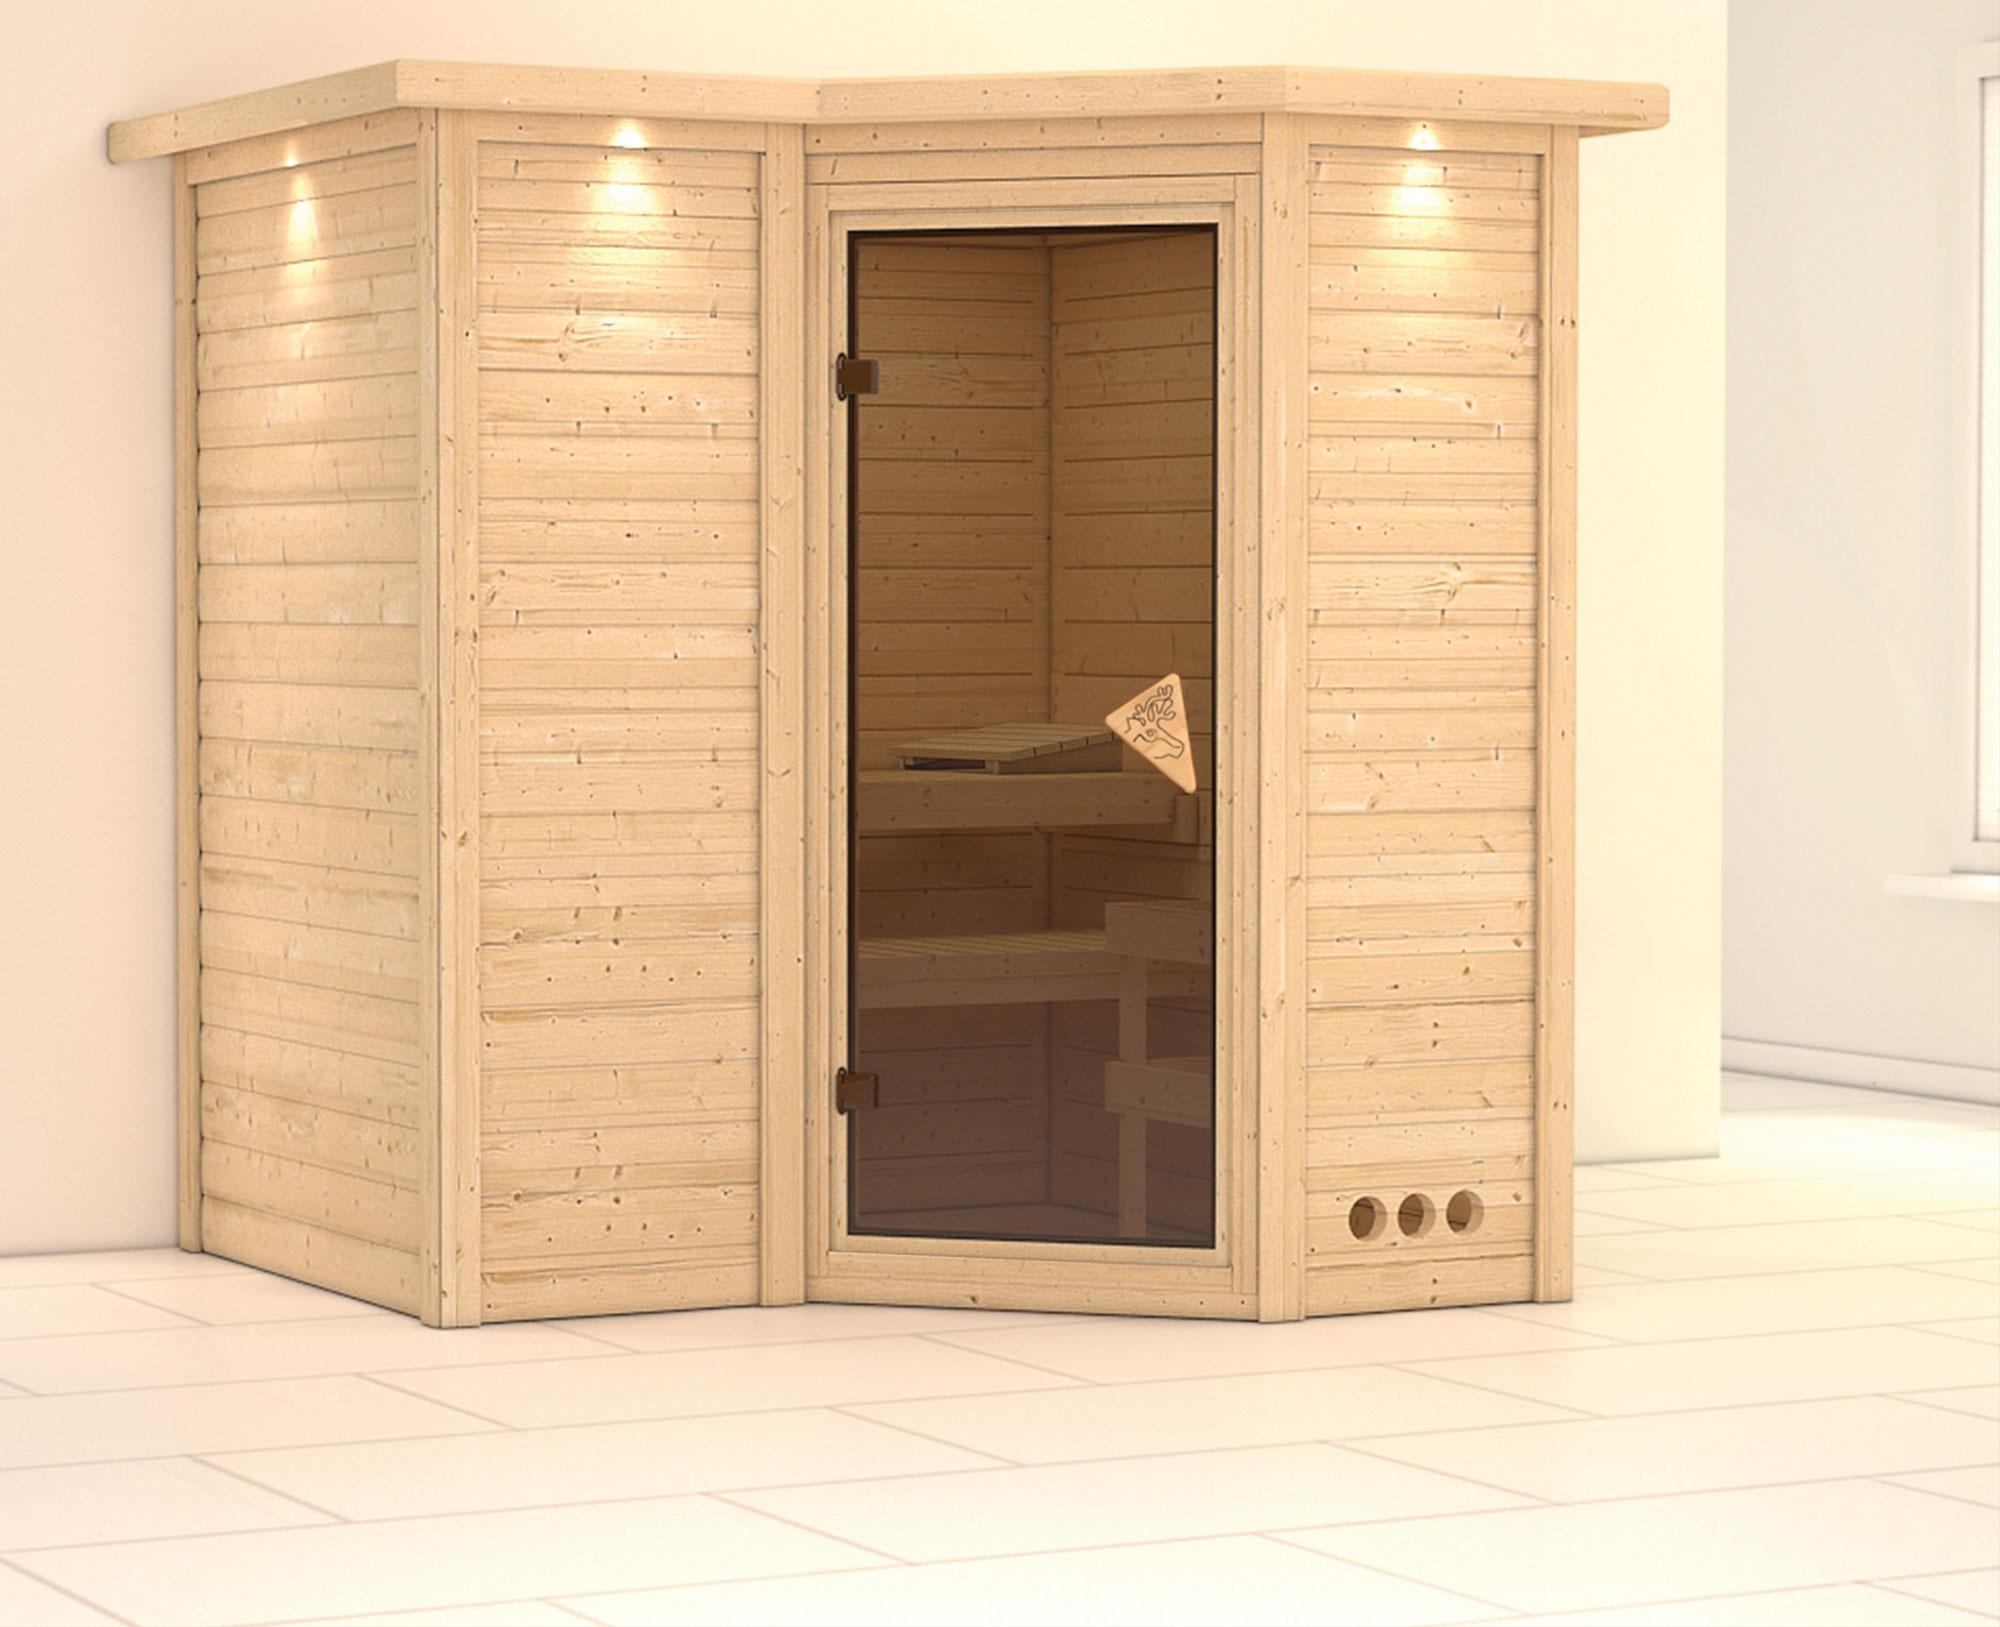 Karibu Sauna Sahib 1 40mm Dachkranz ohne Ofen classic Tür Bild 1